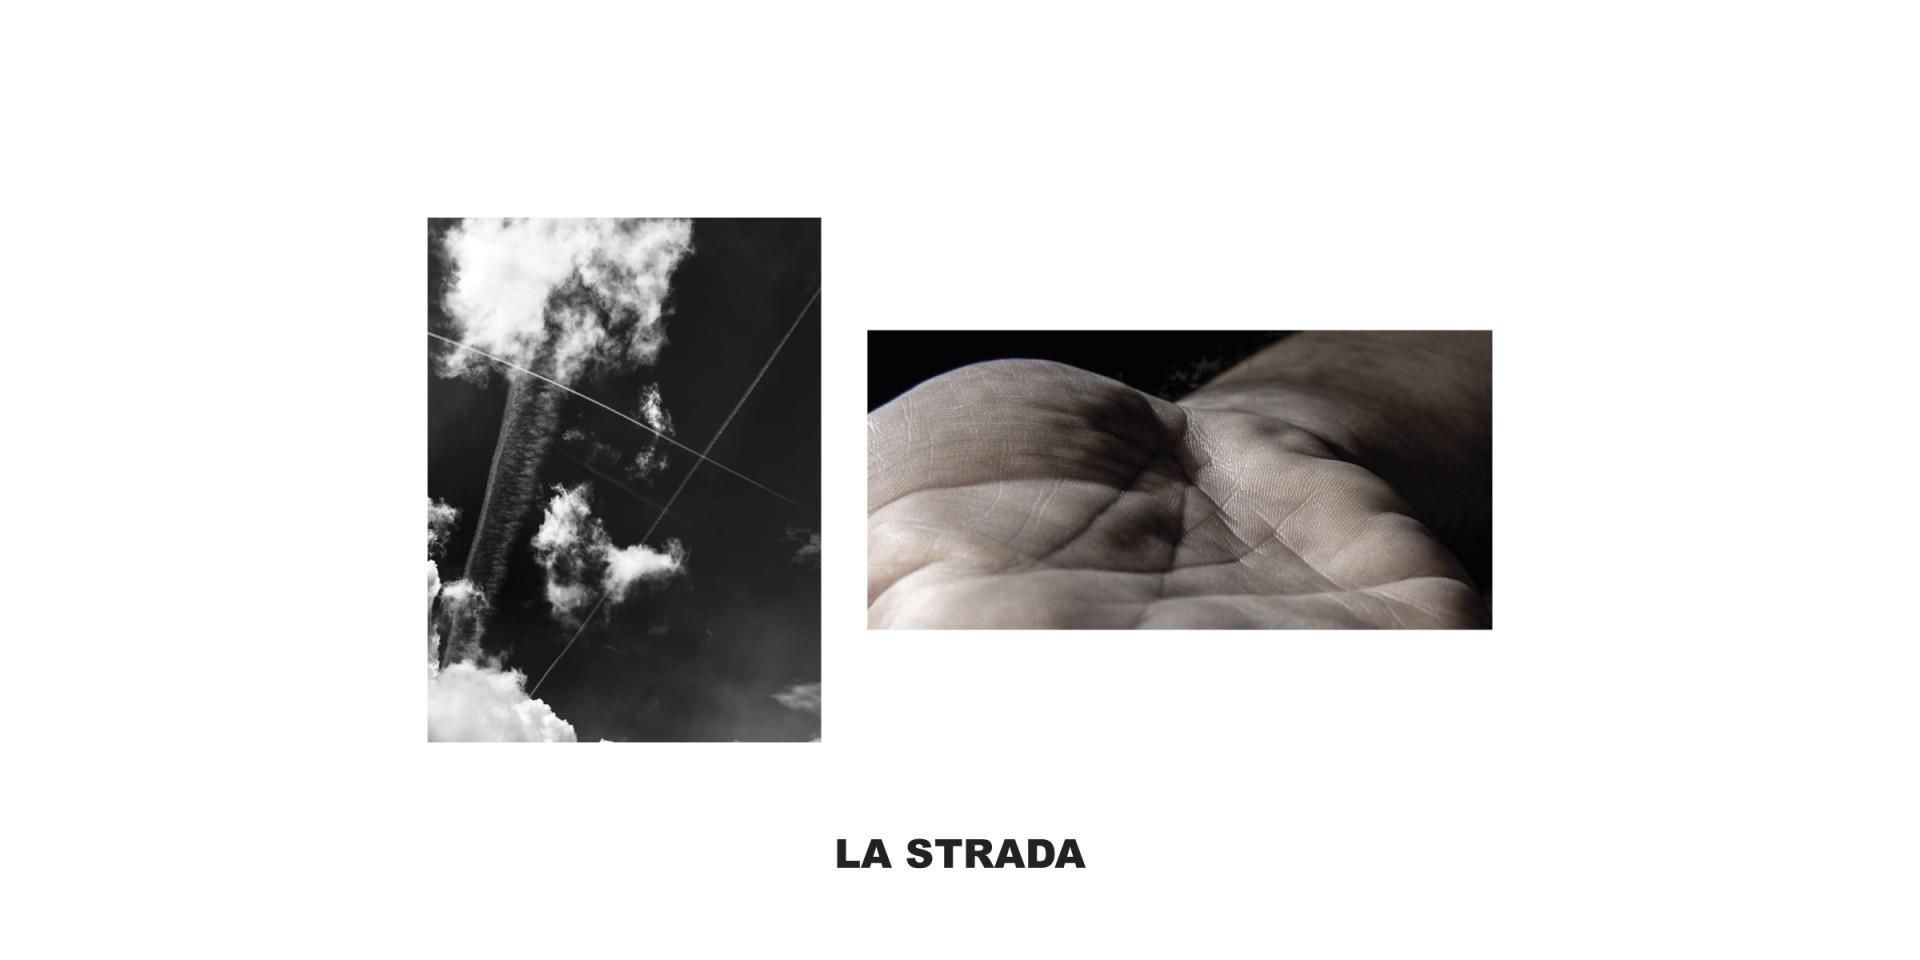 01-slide-la-strada-4.jpg